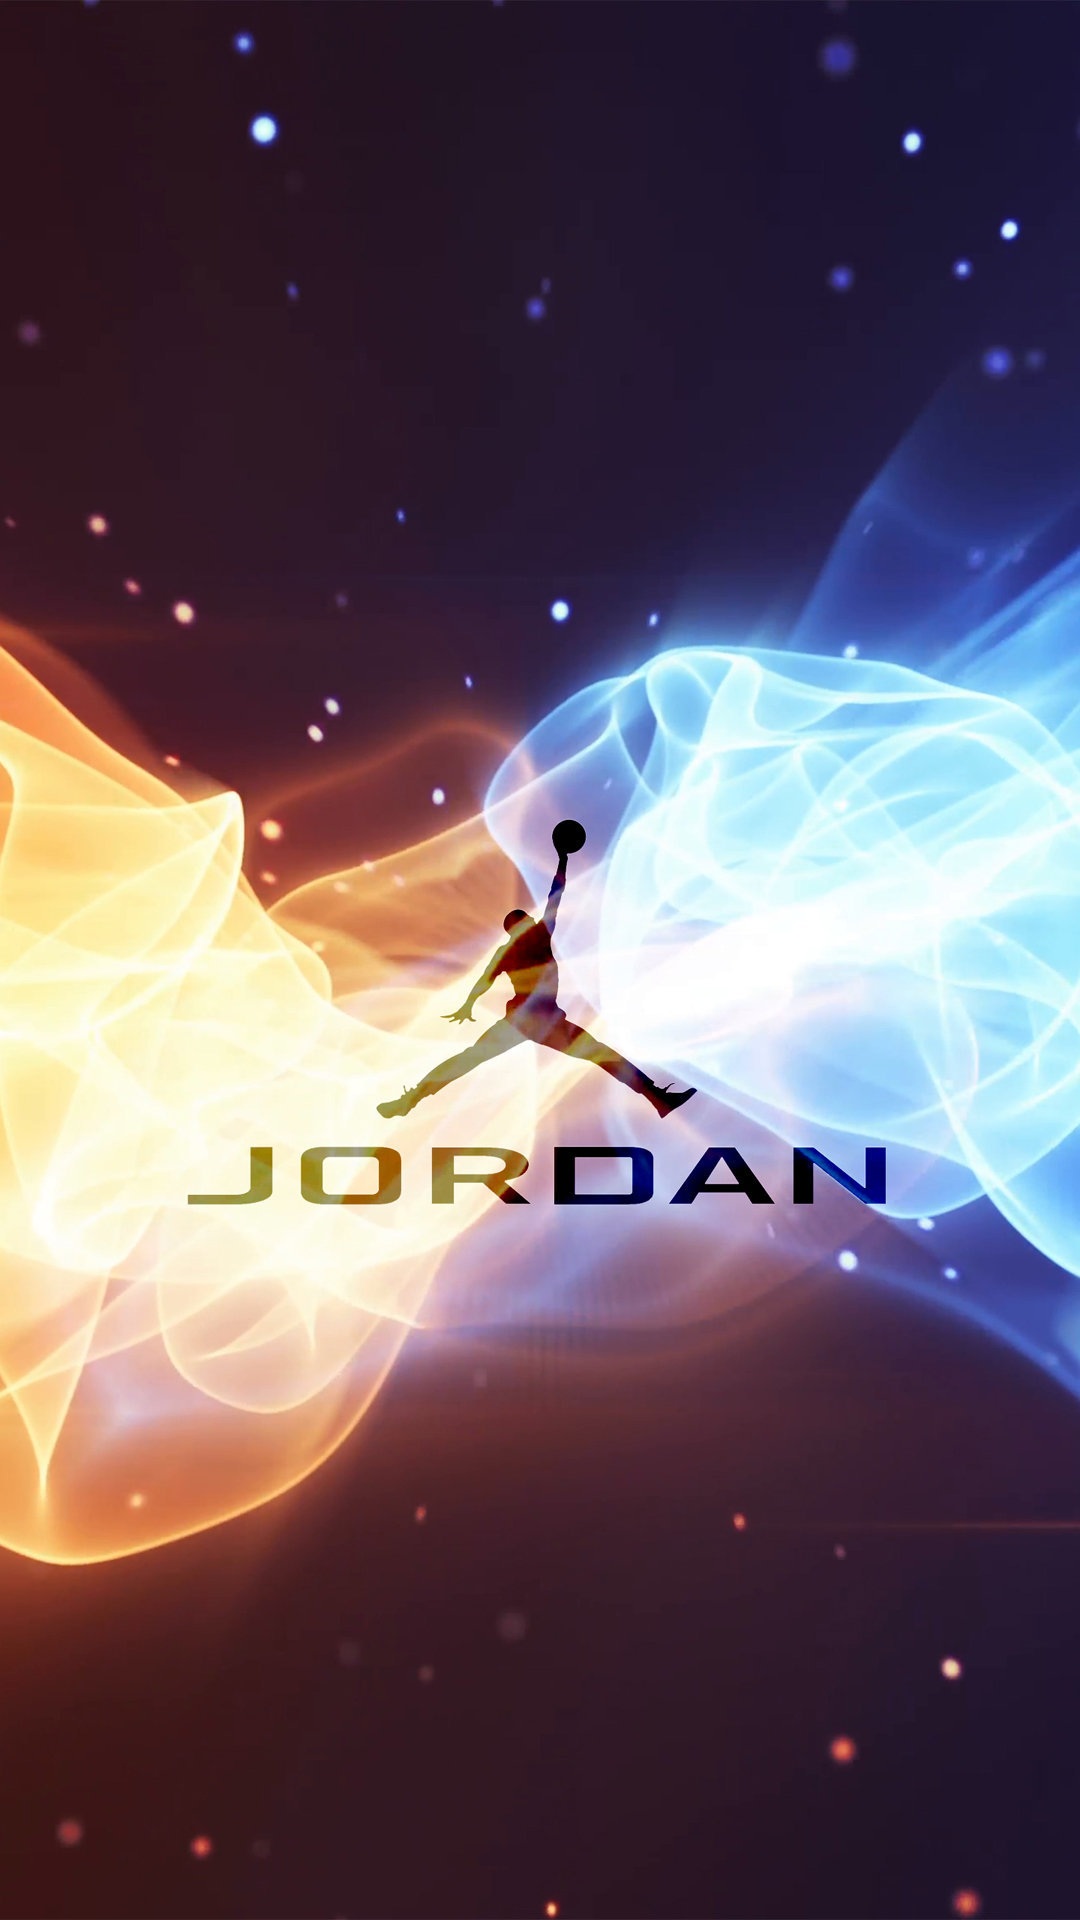 Jordans Wallpaper